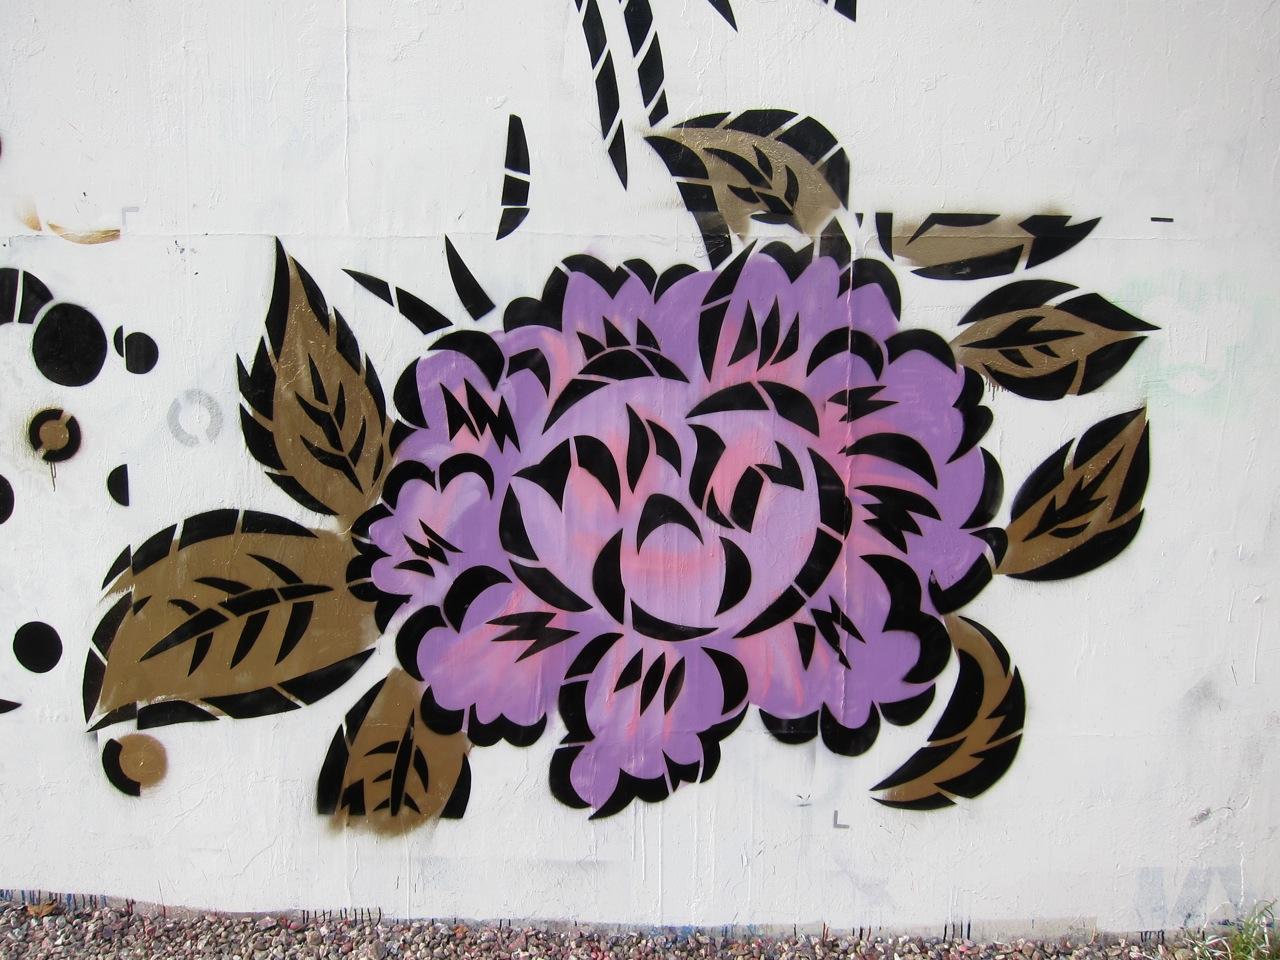 Aiko Houston Bowery Mural AM 1